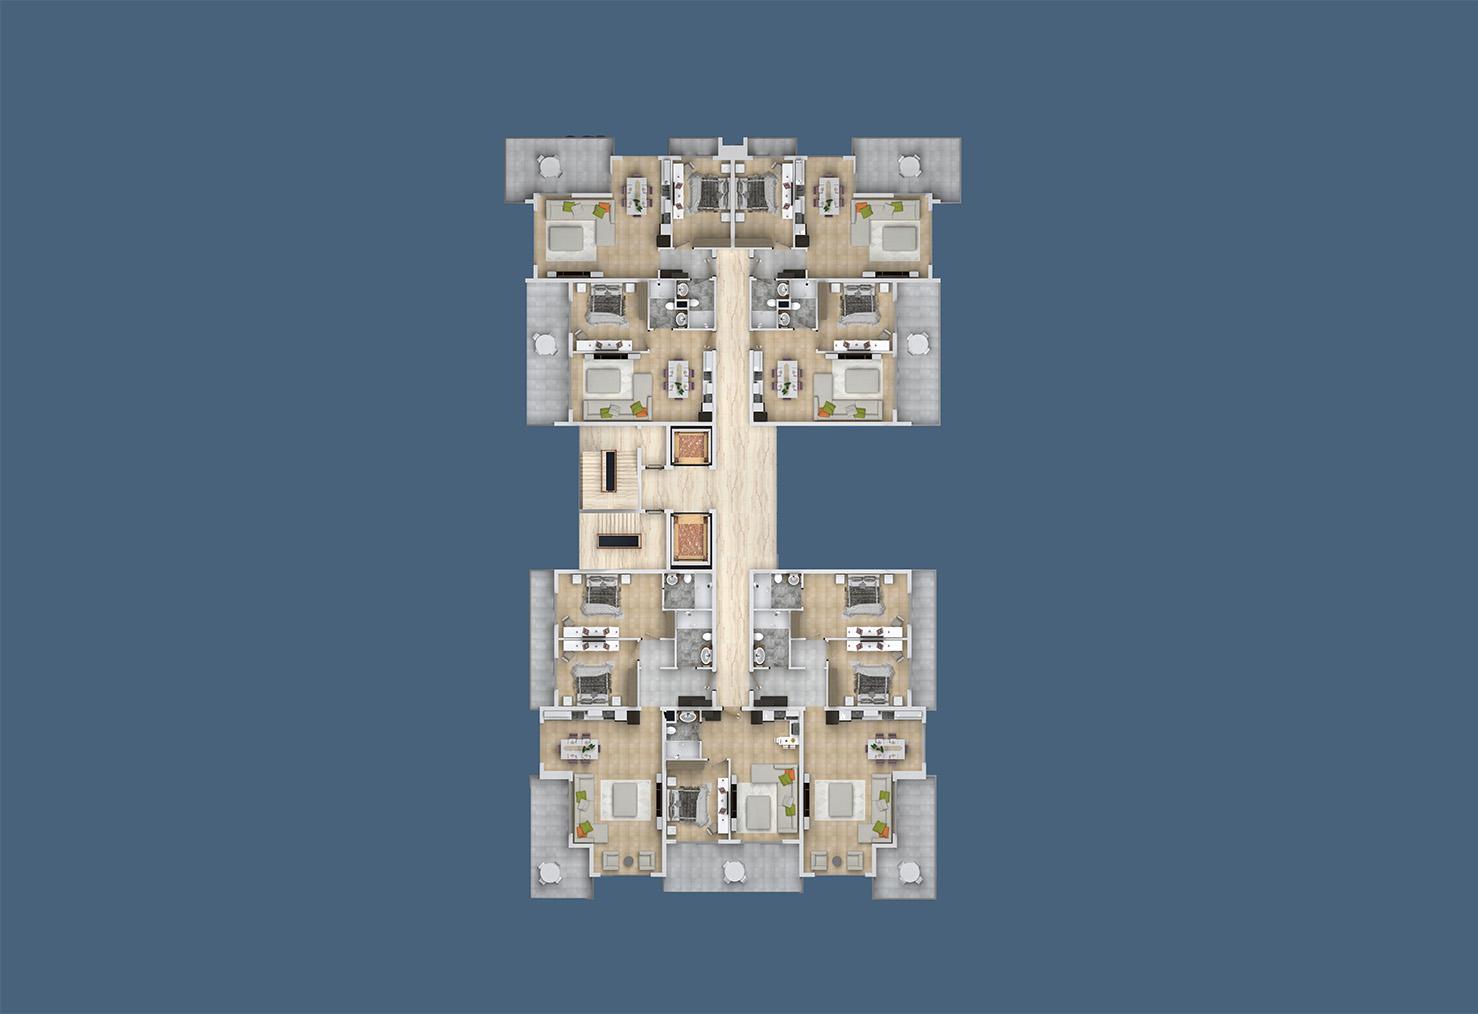 Floor plans of apartments 6 floor «D» Yekta Kingdom Trade Center